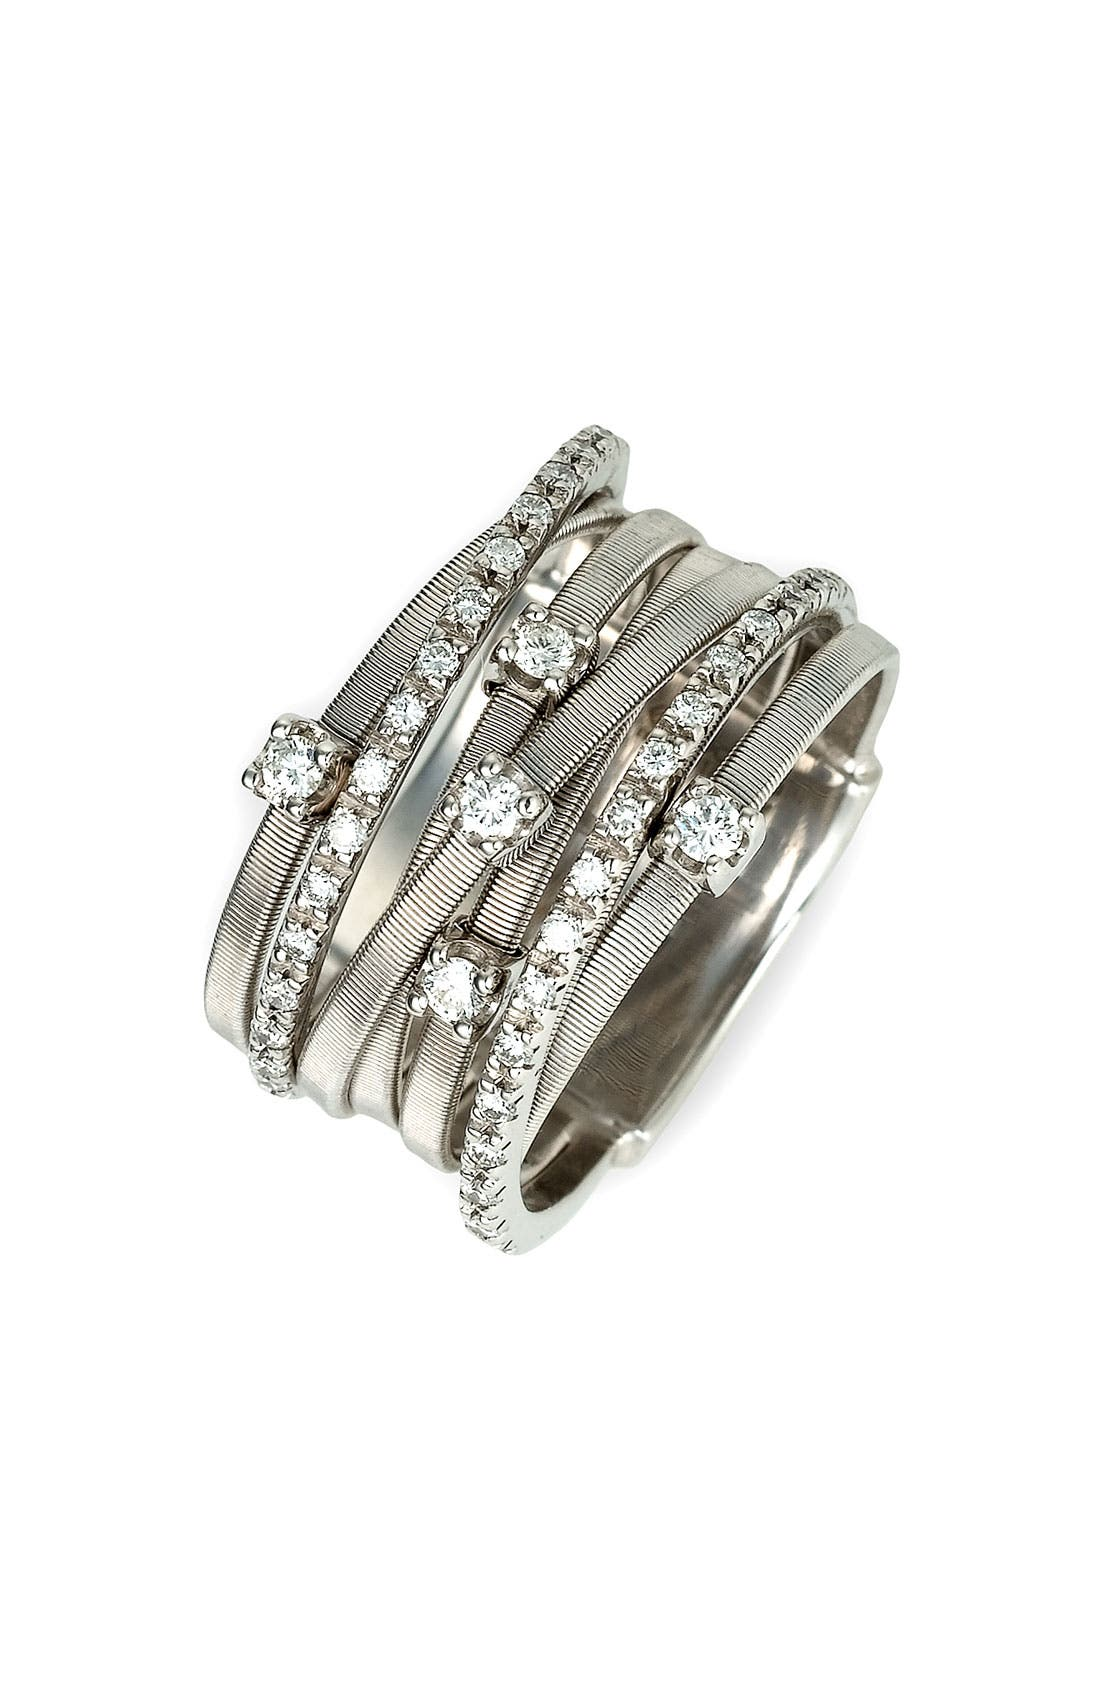 'Goa' Seven Band Diamond Ring,                             Main thumbnail 1, color,                             WHITE GOLD